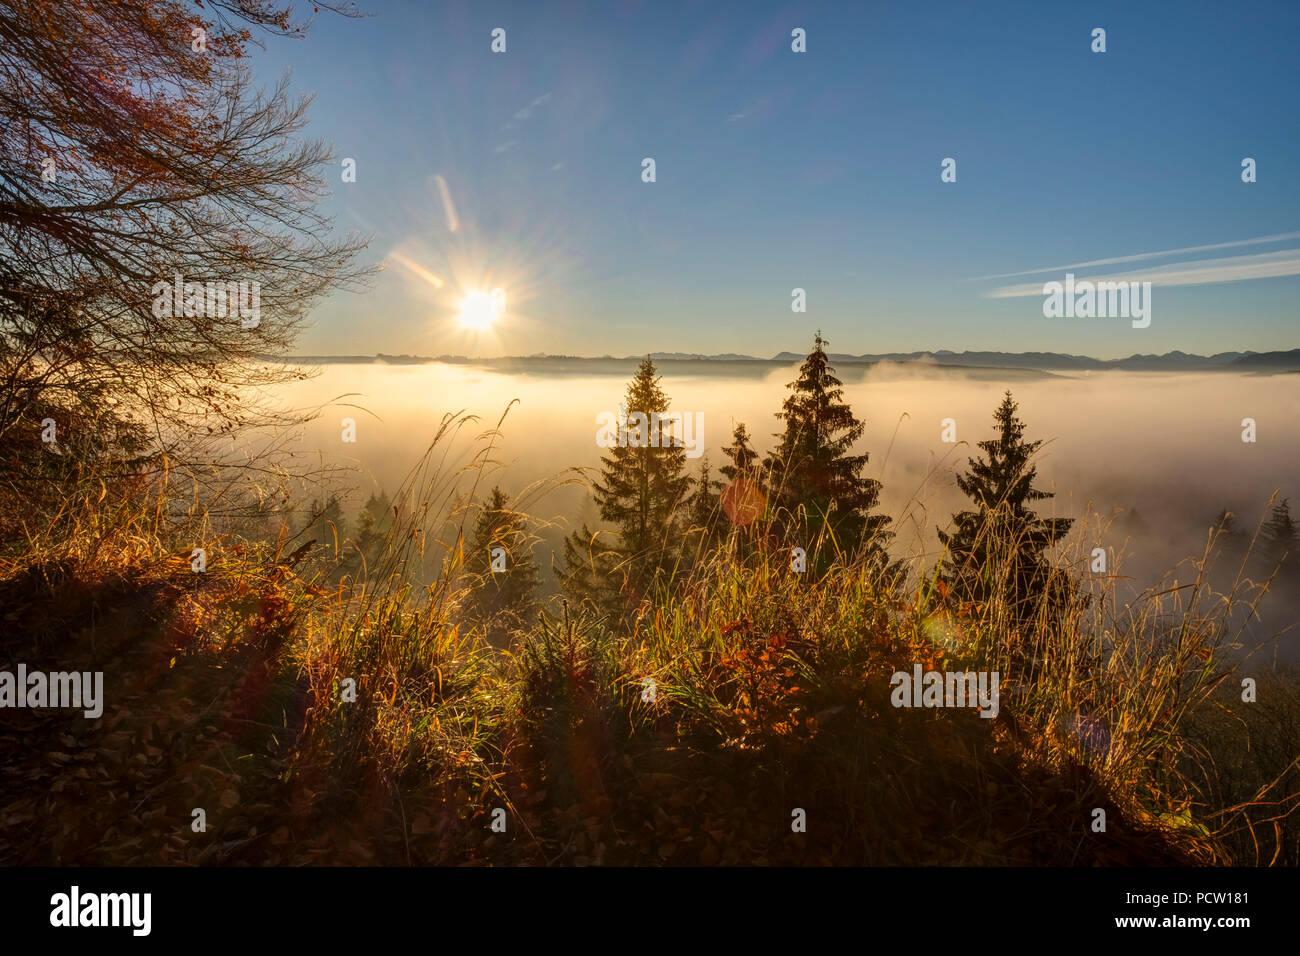 Morning mist, White Wall at Icking, Pupplinger Au, Upper Bavaria, Bavaria, Germany - Stock Image